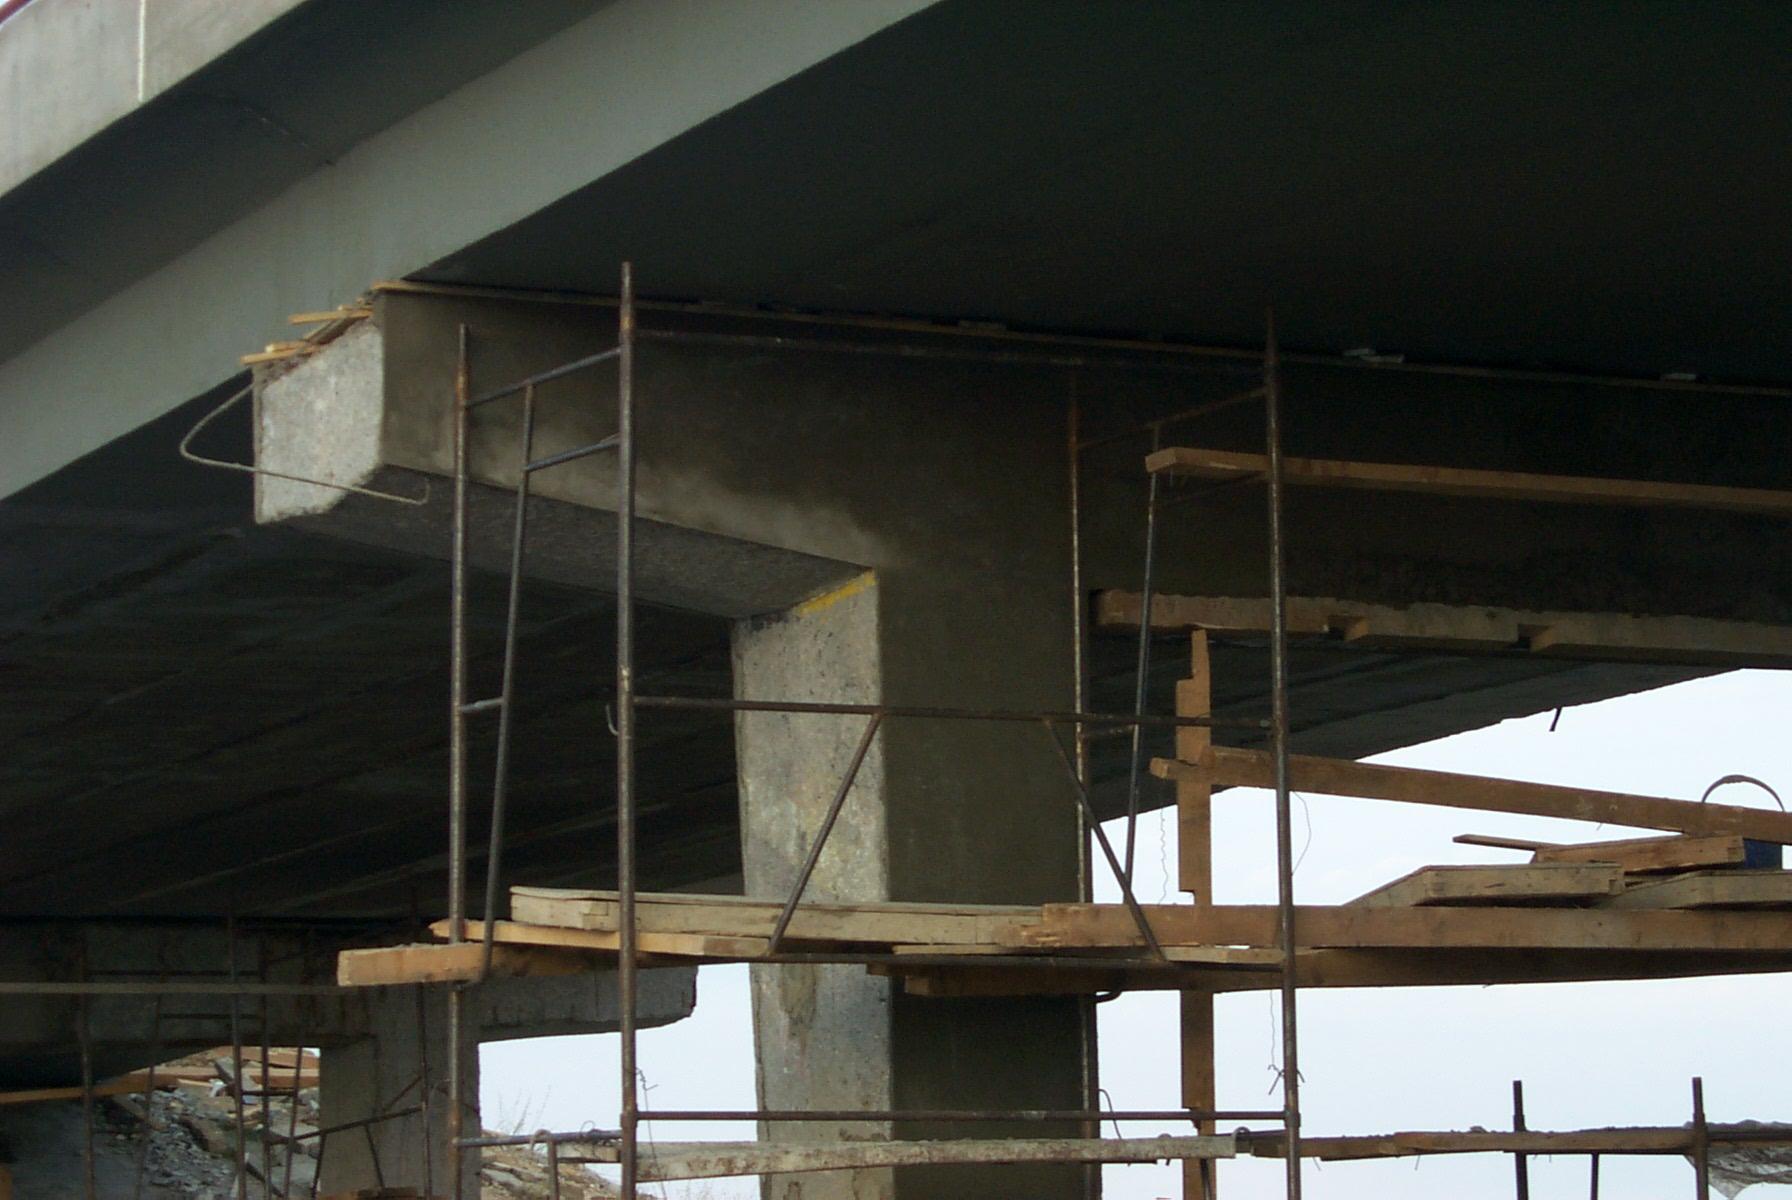 Reparatii pasaje peste Autostrada Bucuresti Pitesti MAPEI - Poza 86